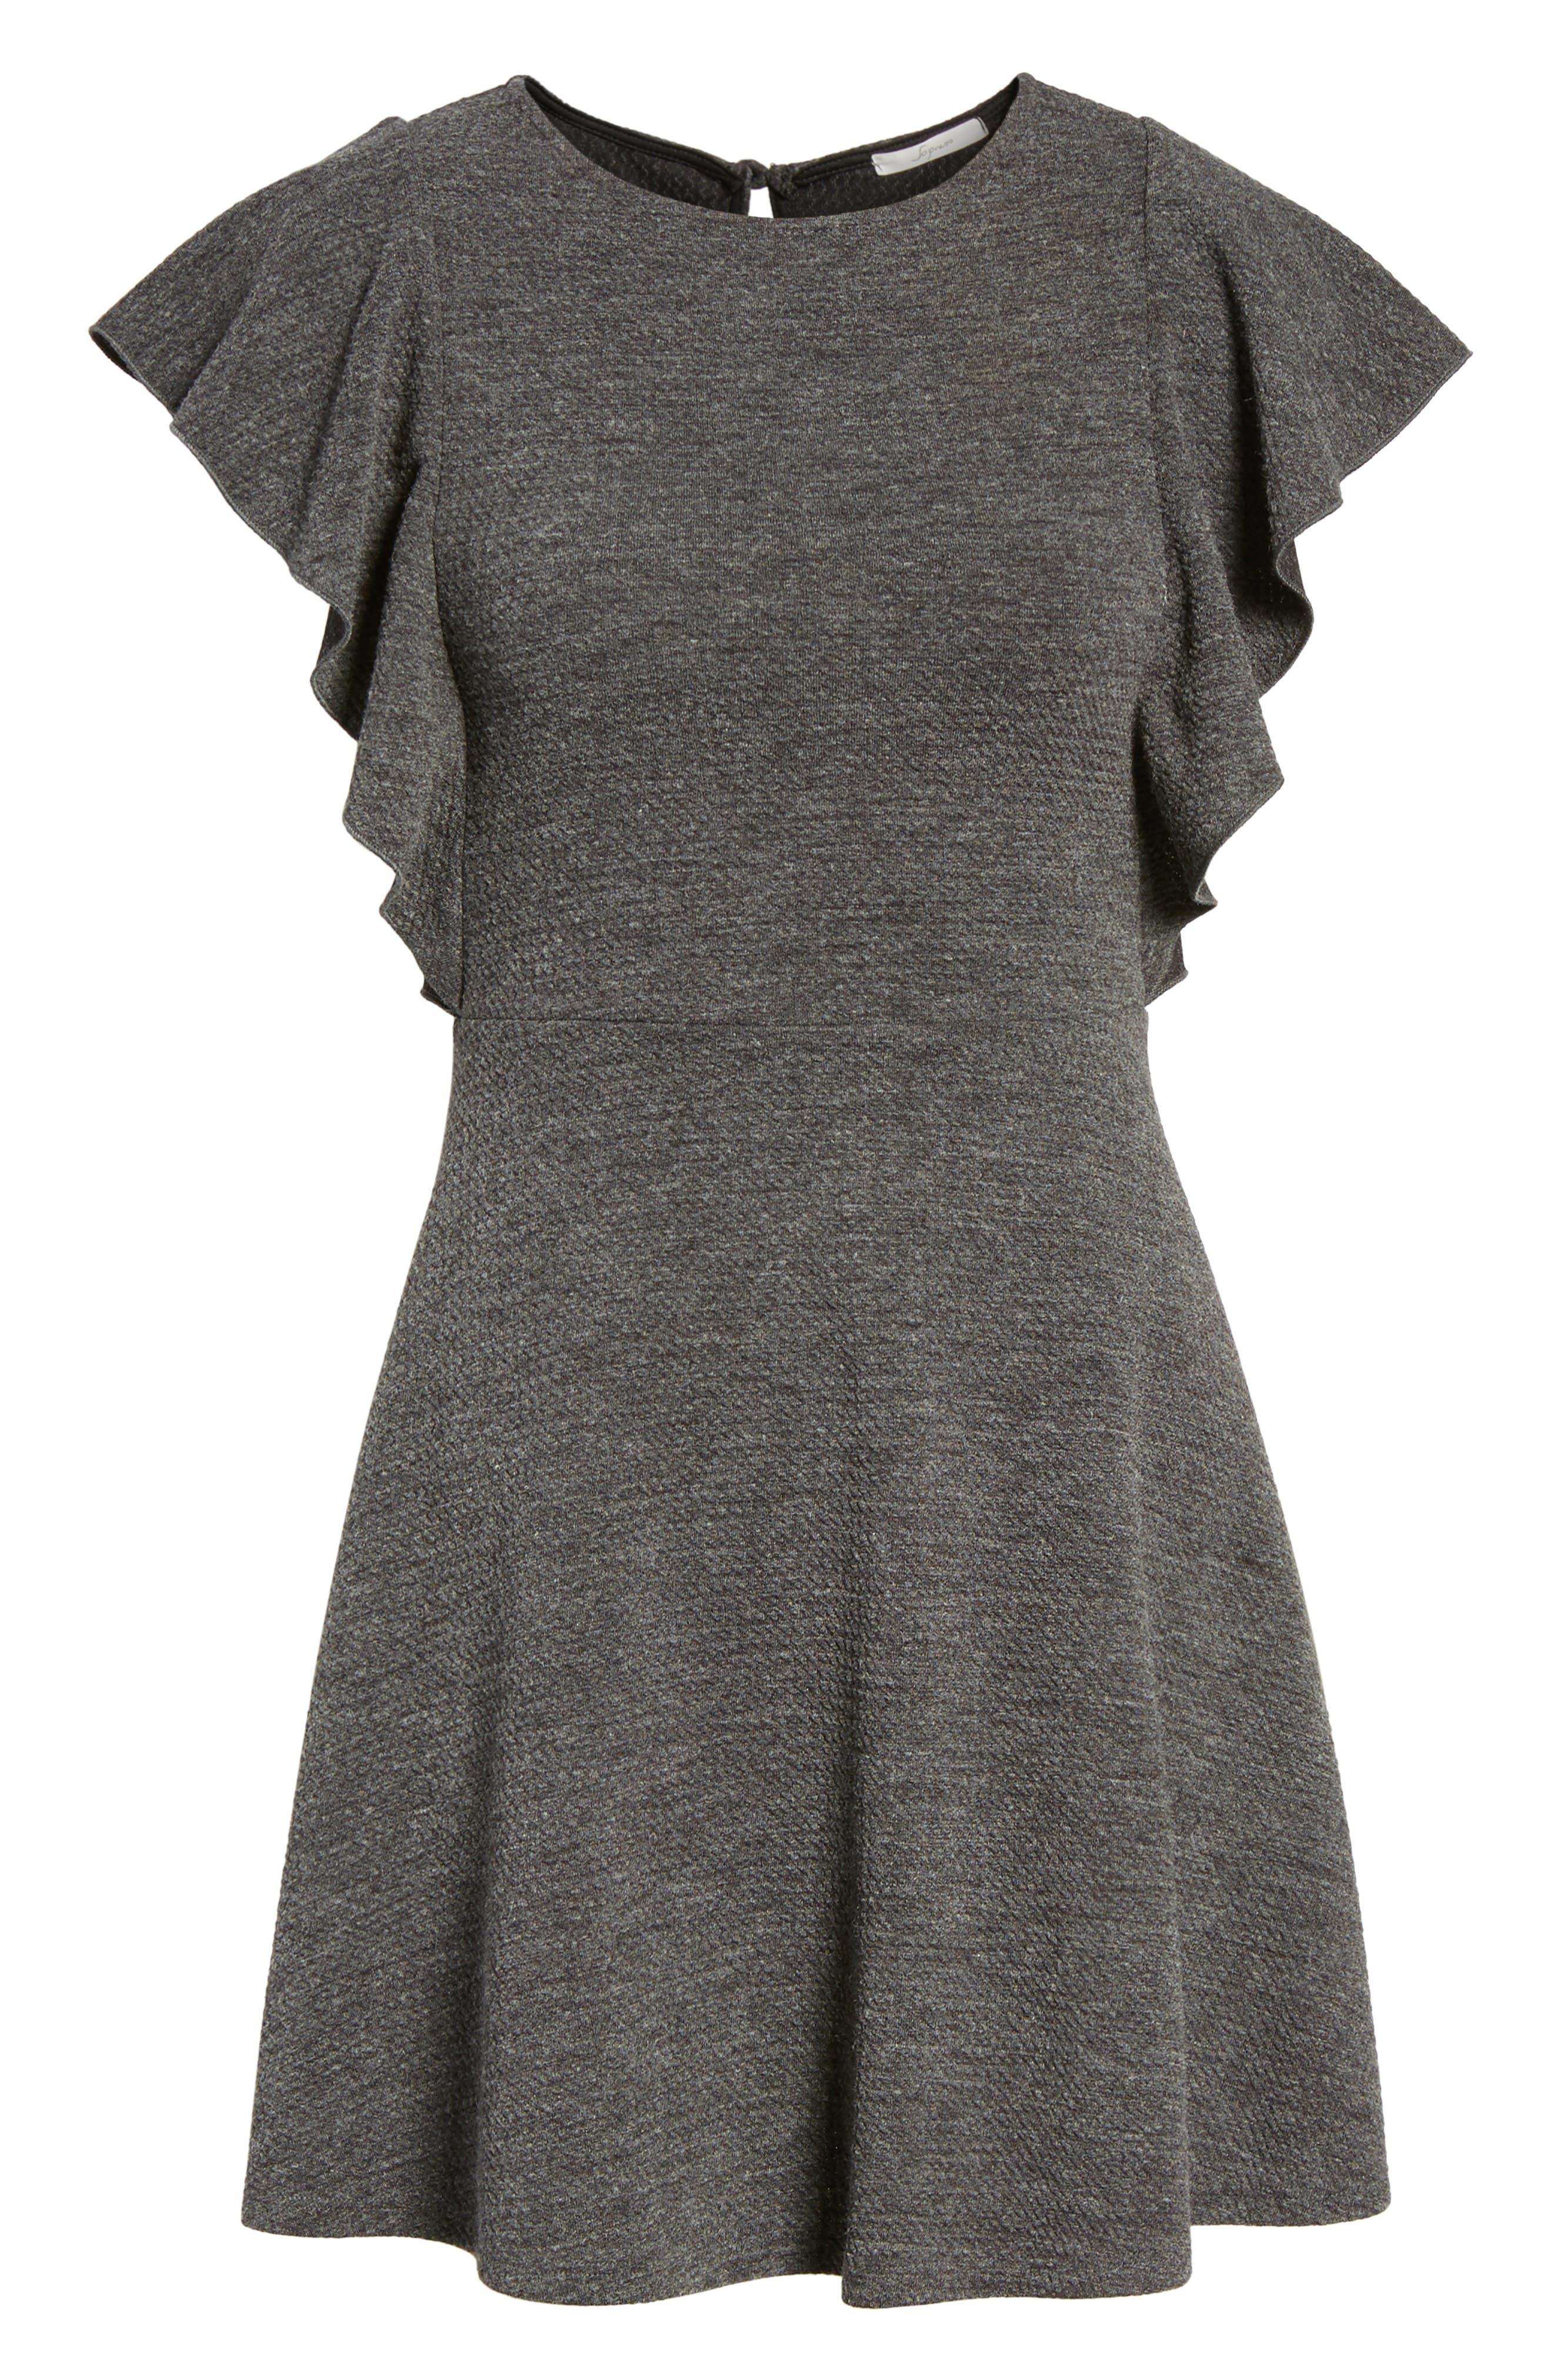 Ruffle Sleeve Knit Minidress,                             Alternate thumbnail 6, color,                             020